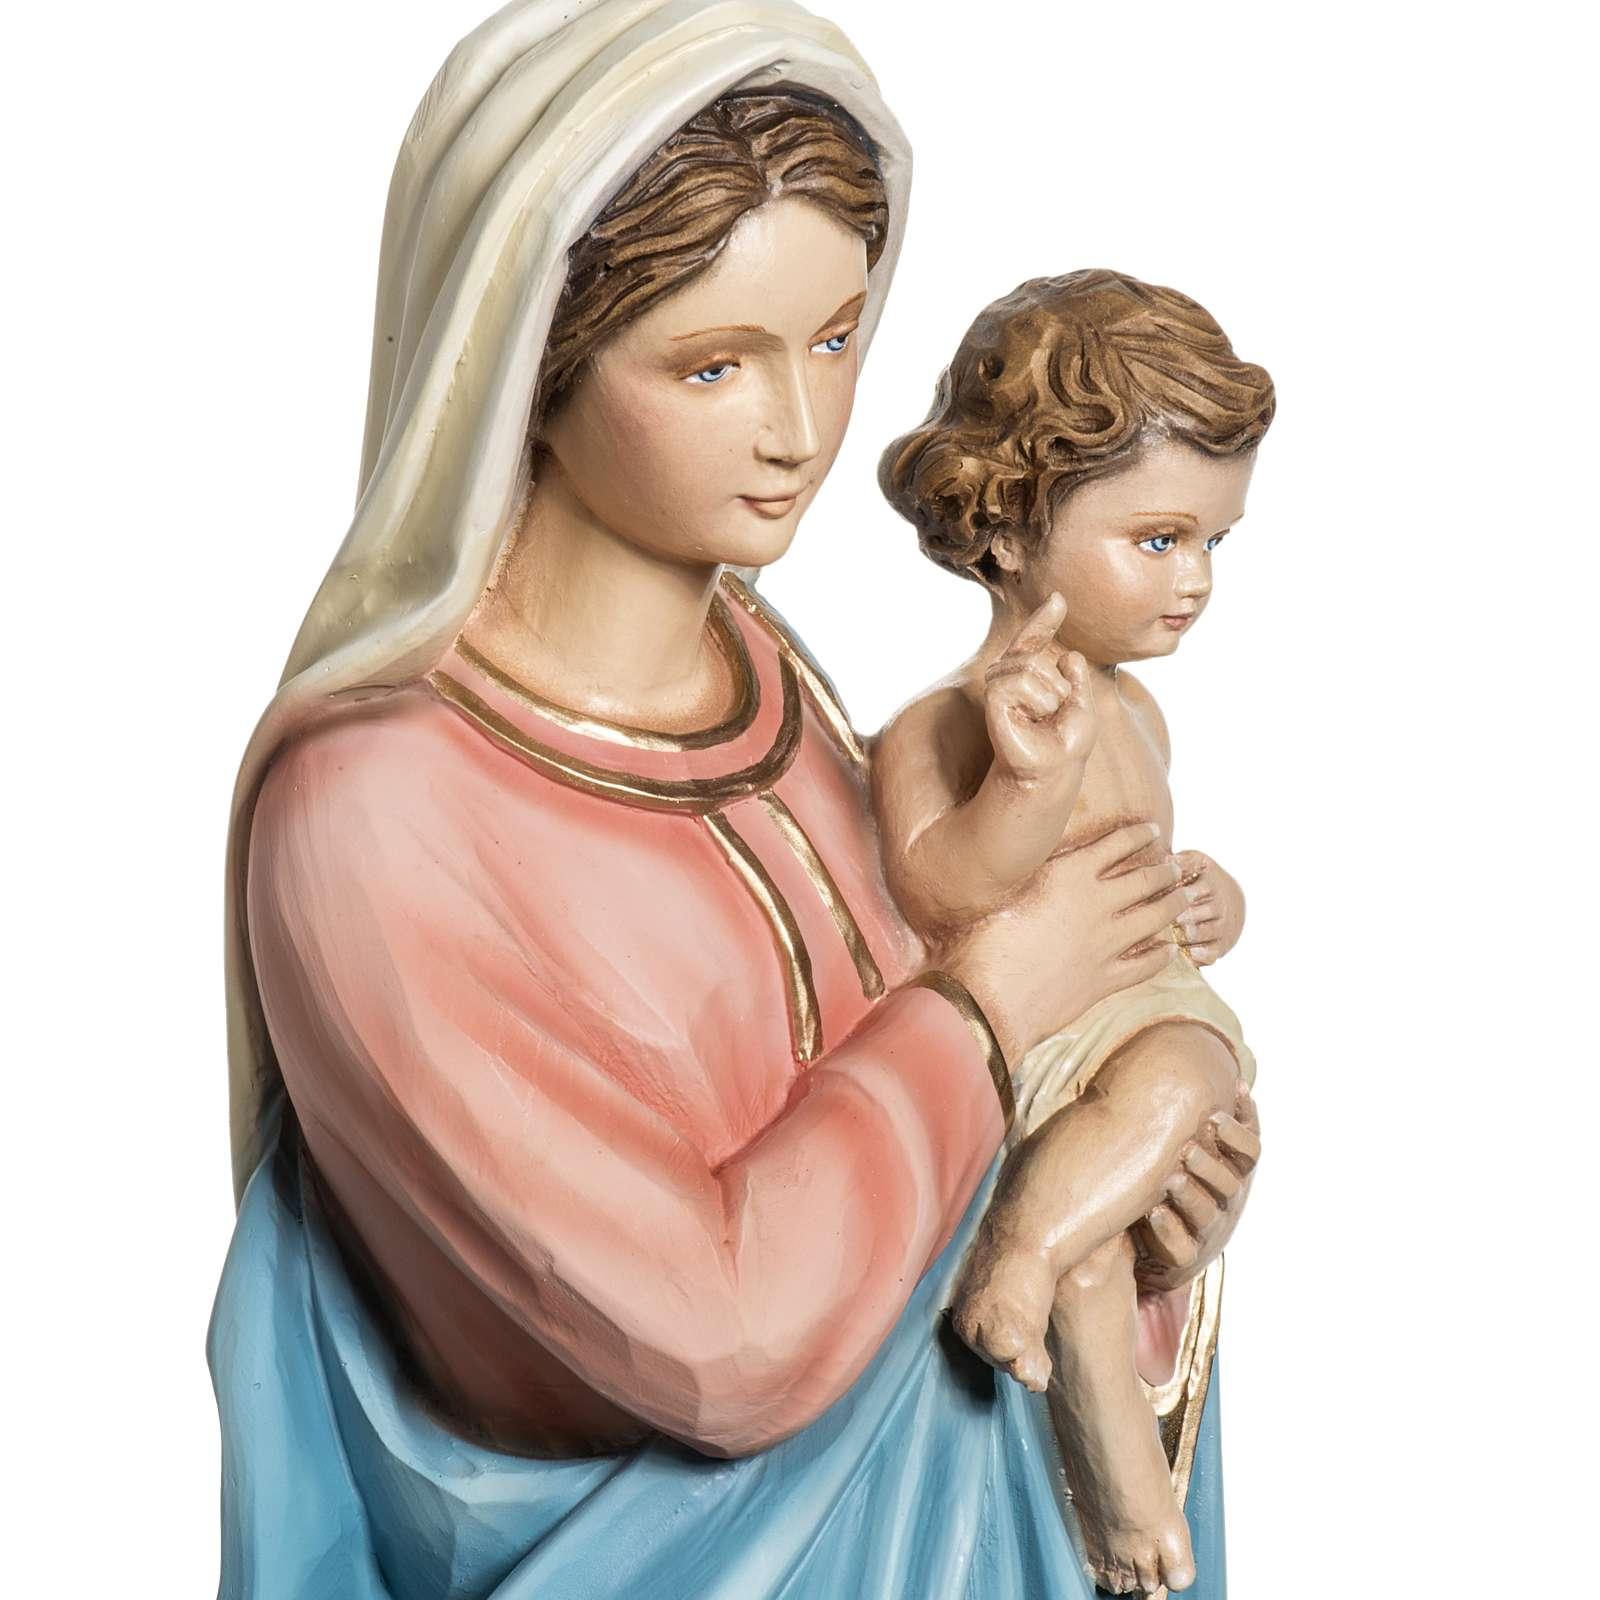 Virgin Mary and baby Jesus fiberglass statue 60 cm 4